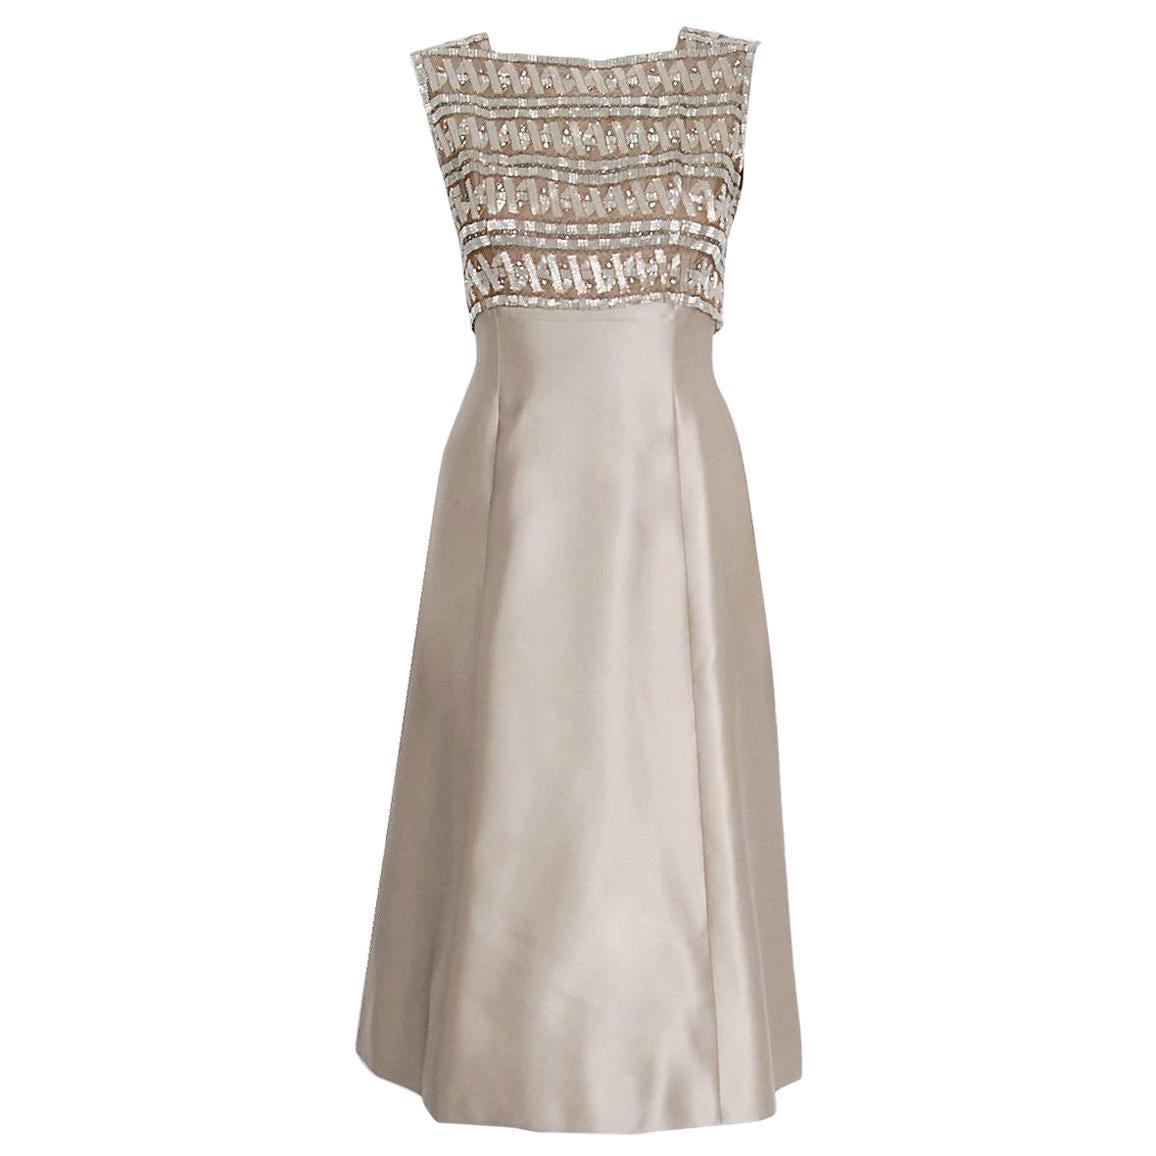 Vintage 1967 Pierre Balmain Haute-Couture Beaded Lesage Satin Dress and Jacket